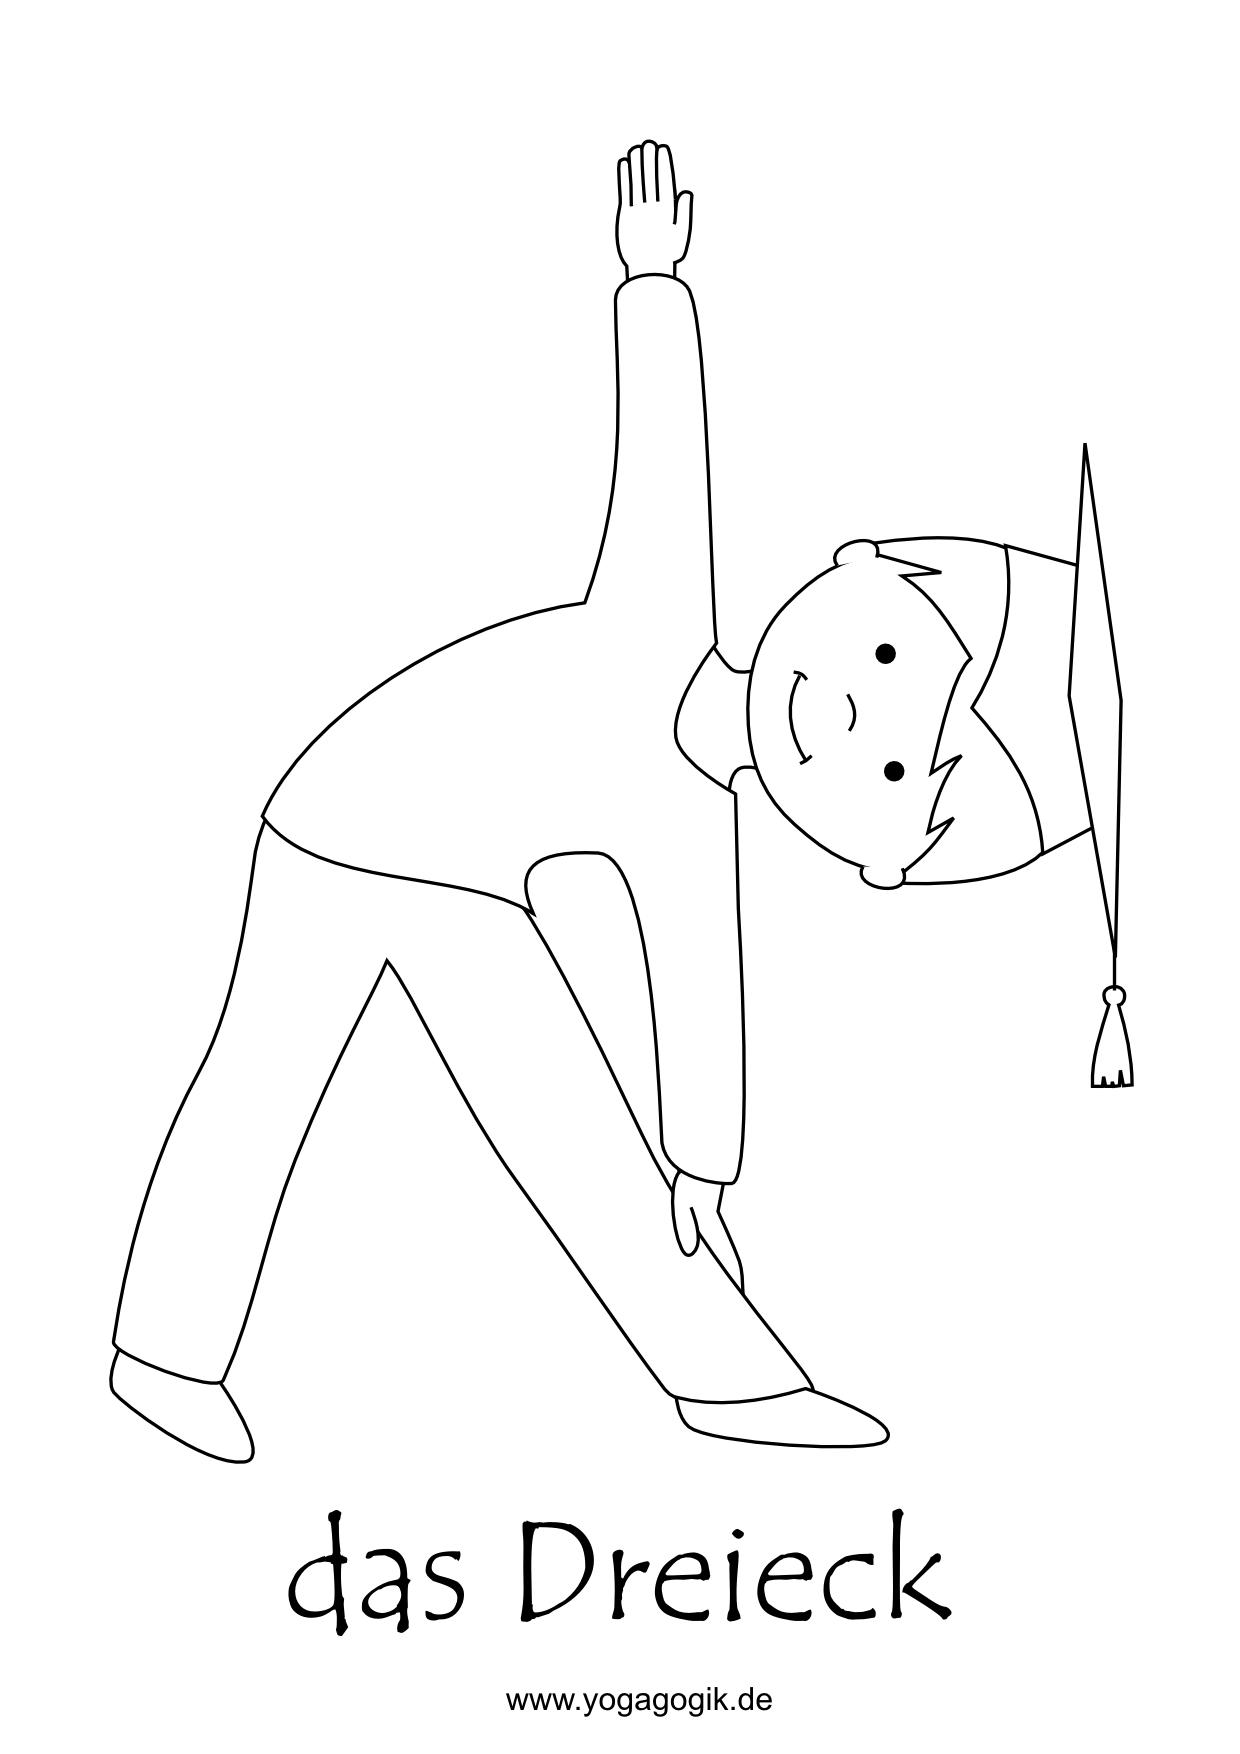 ausmalbilder yoga